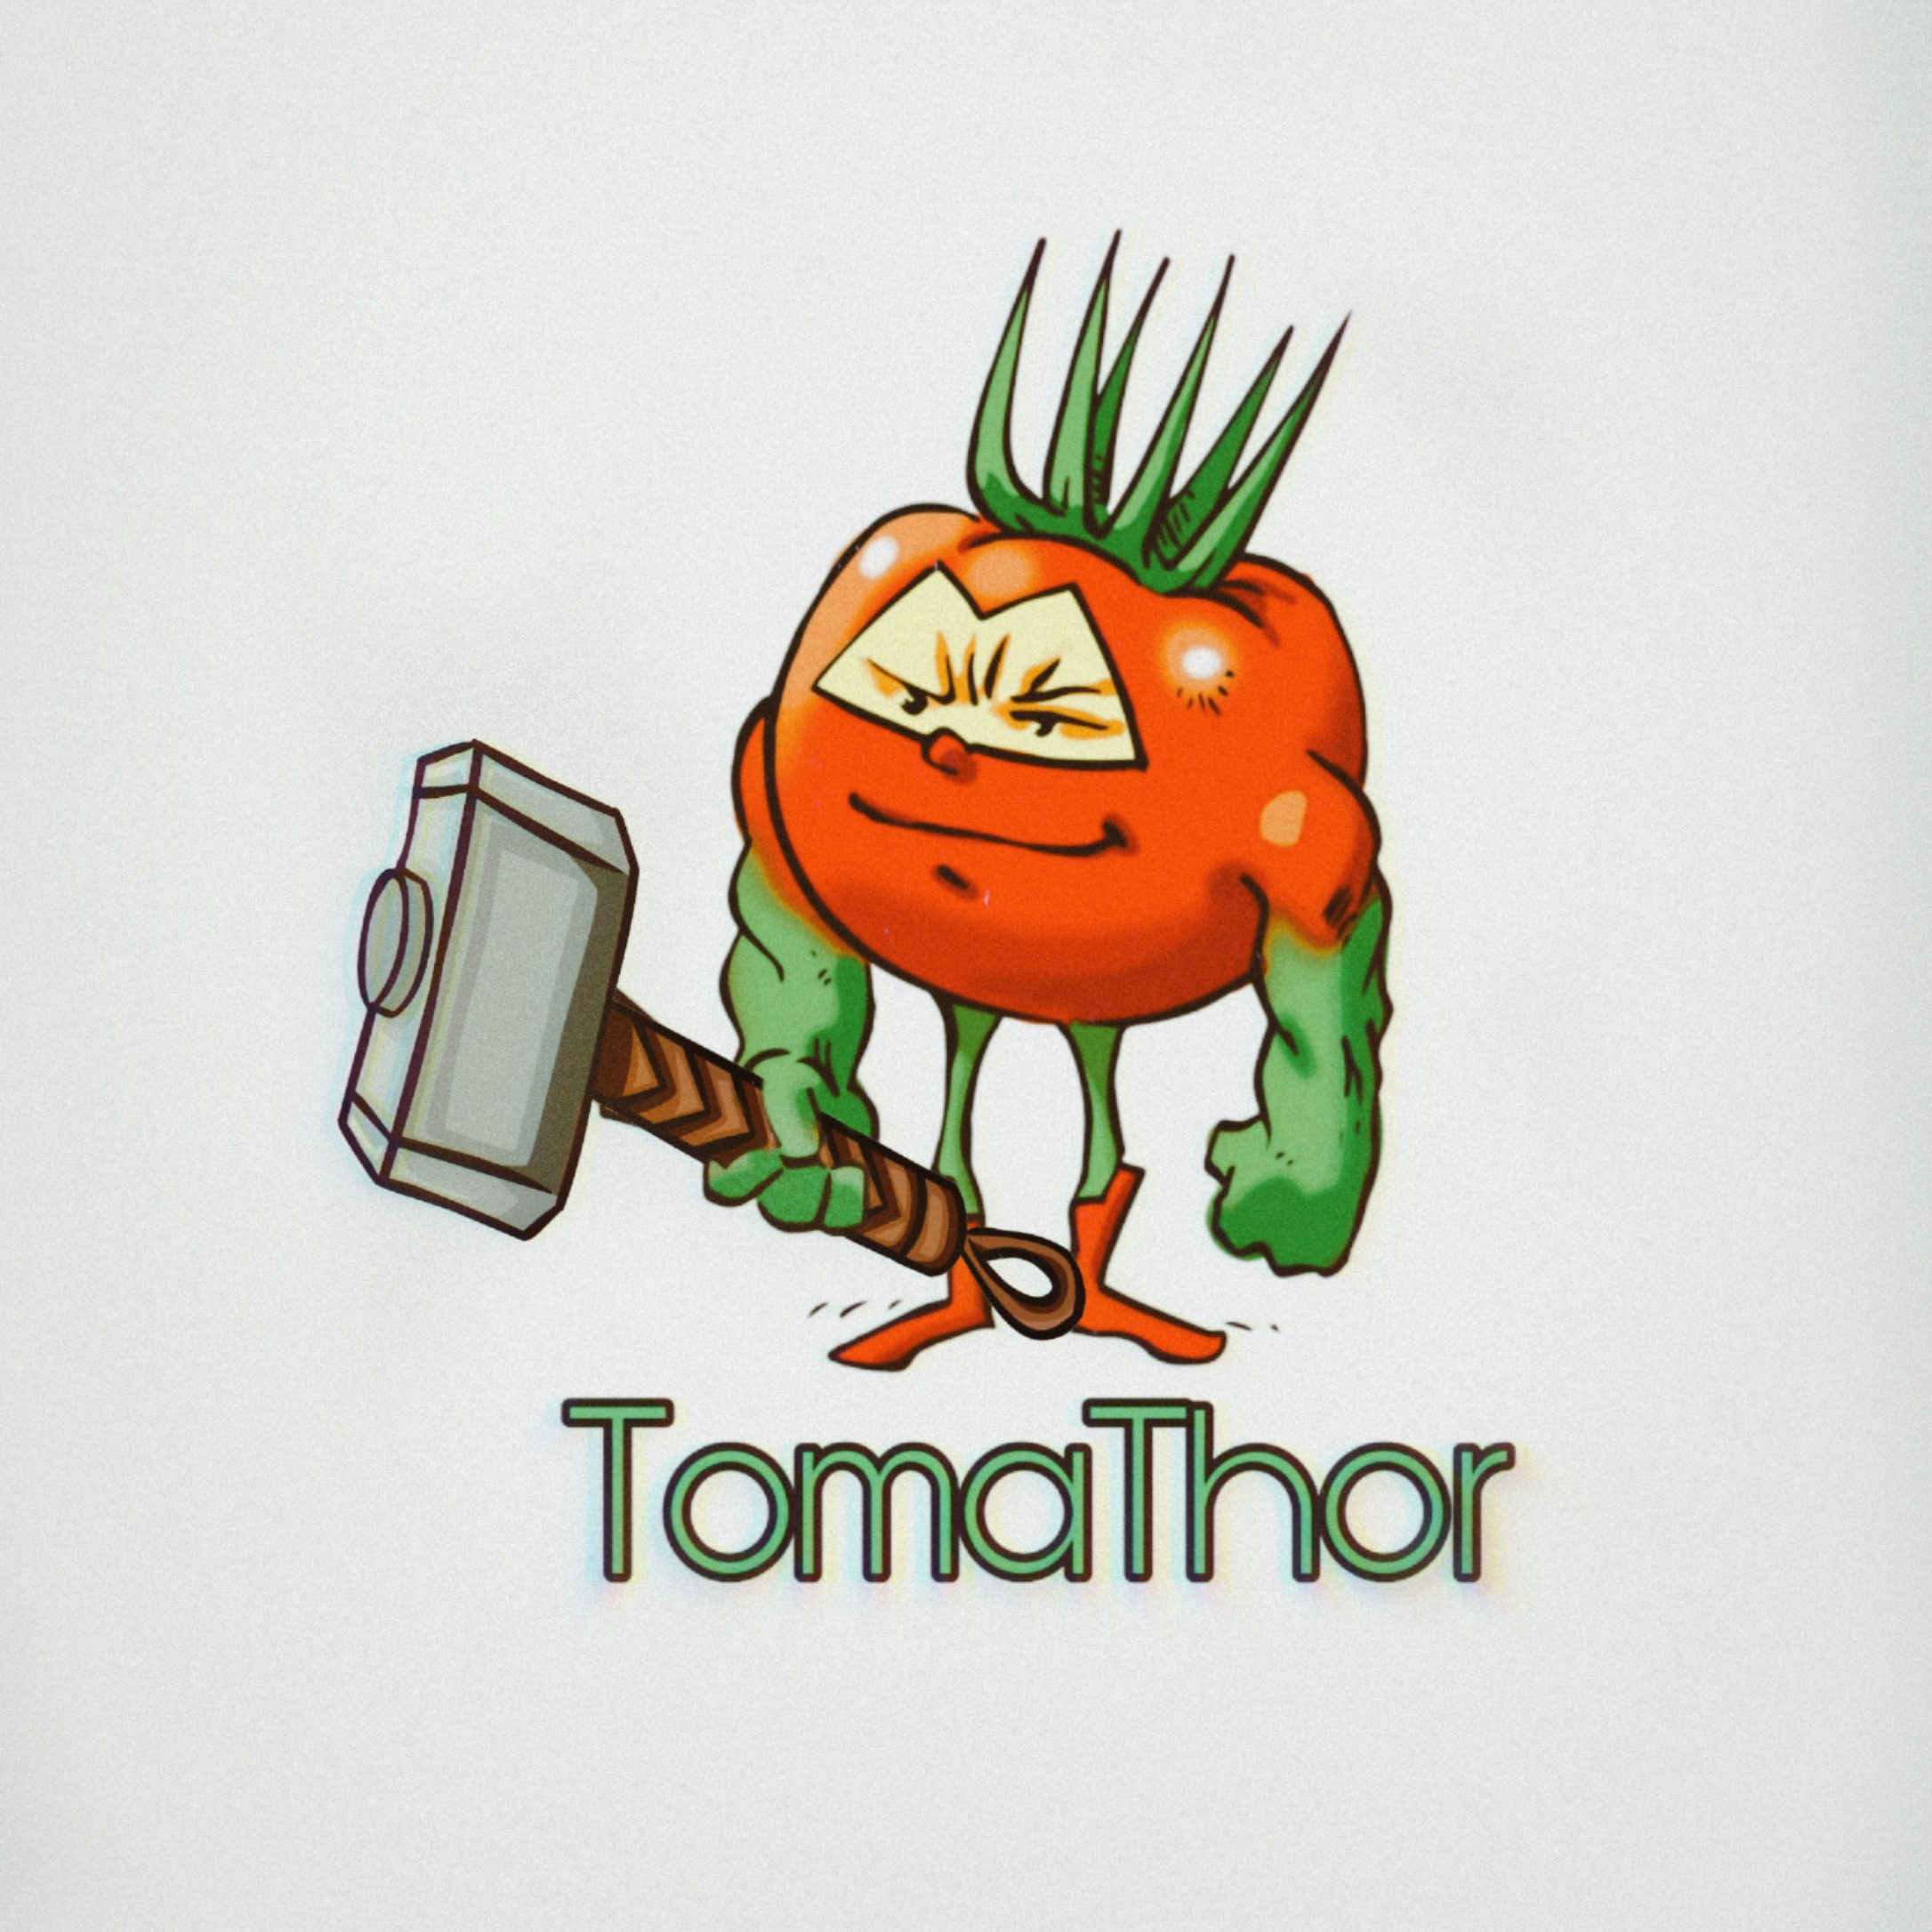 TomaThor